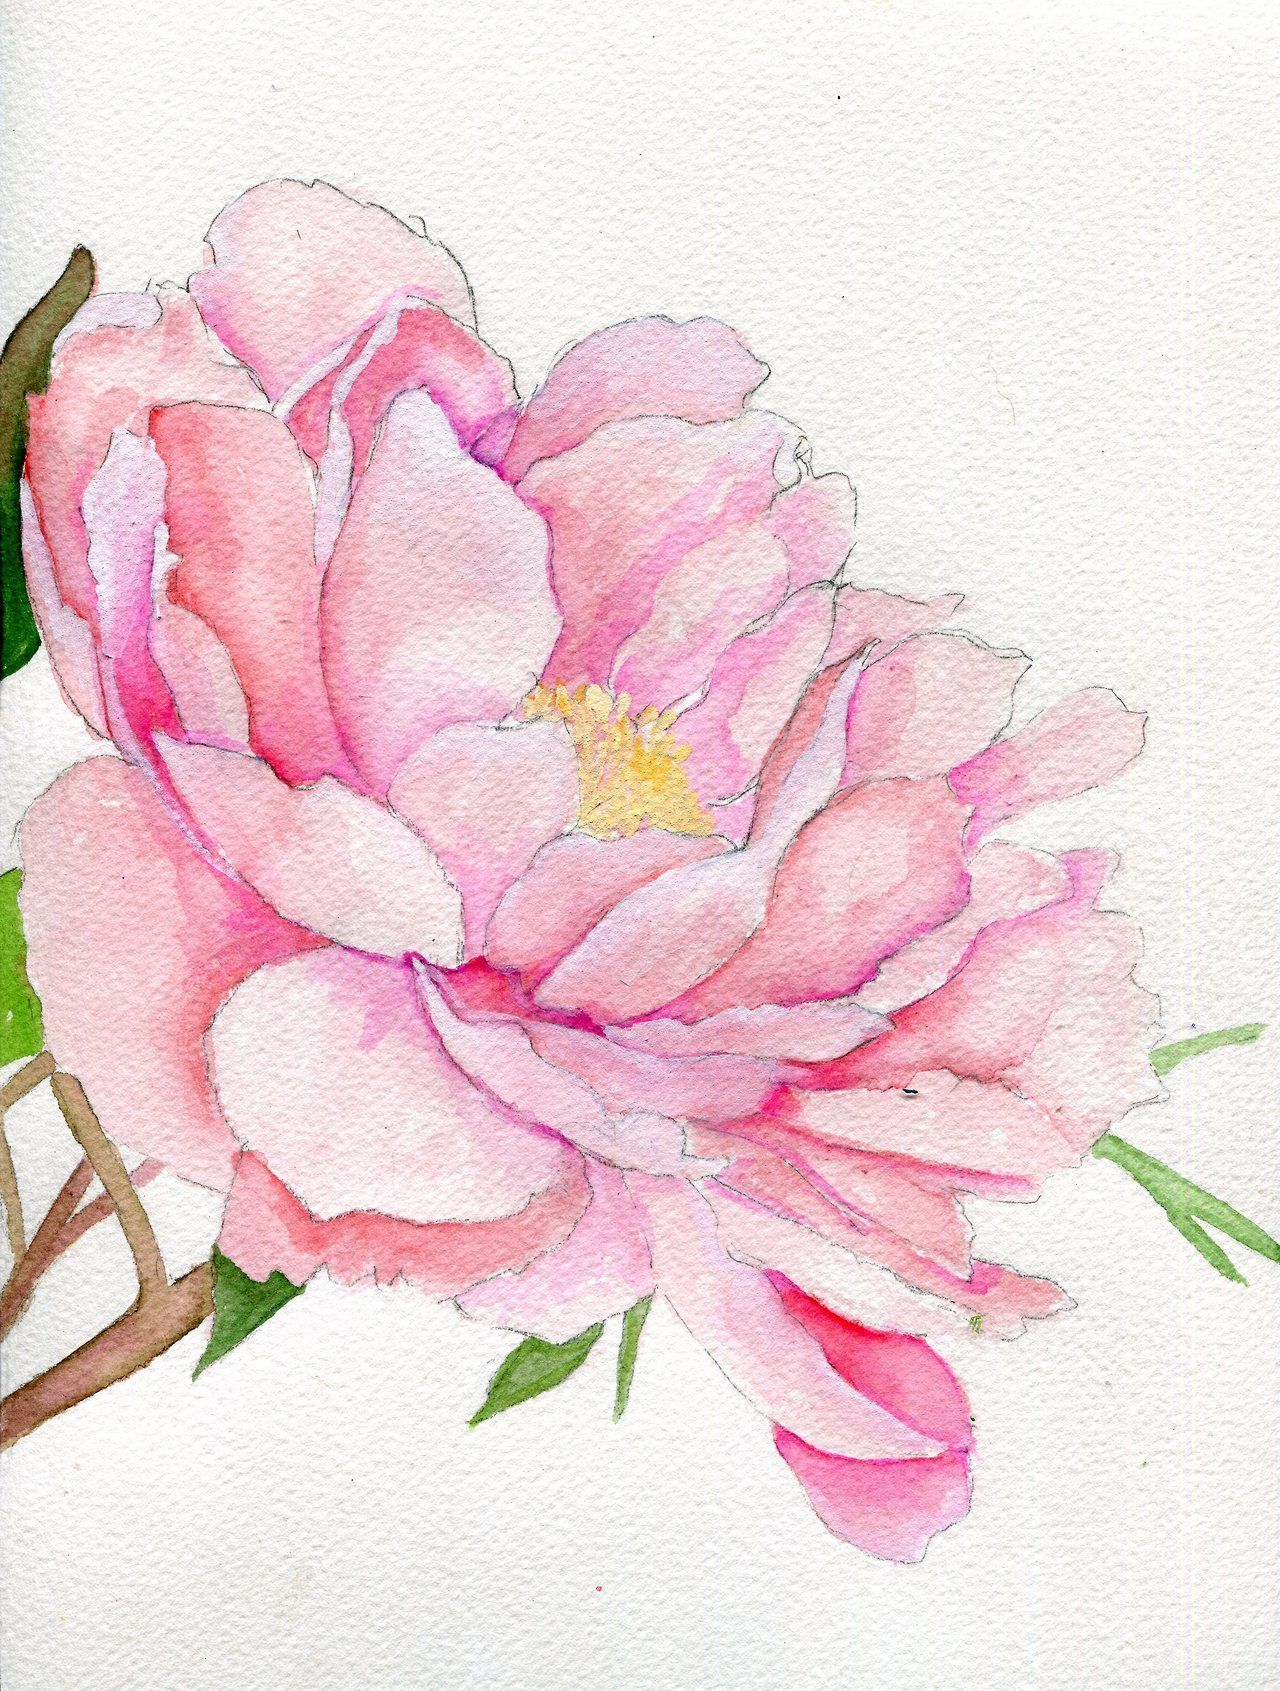 Watercolor Peonies Tumblr Watercolor Peonies Floral